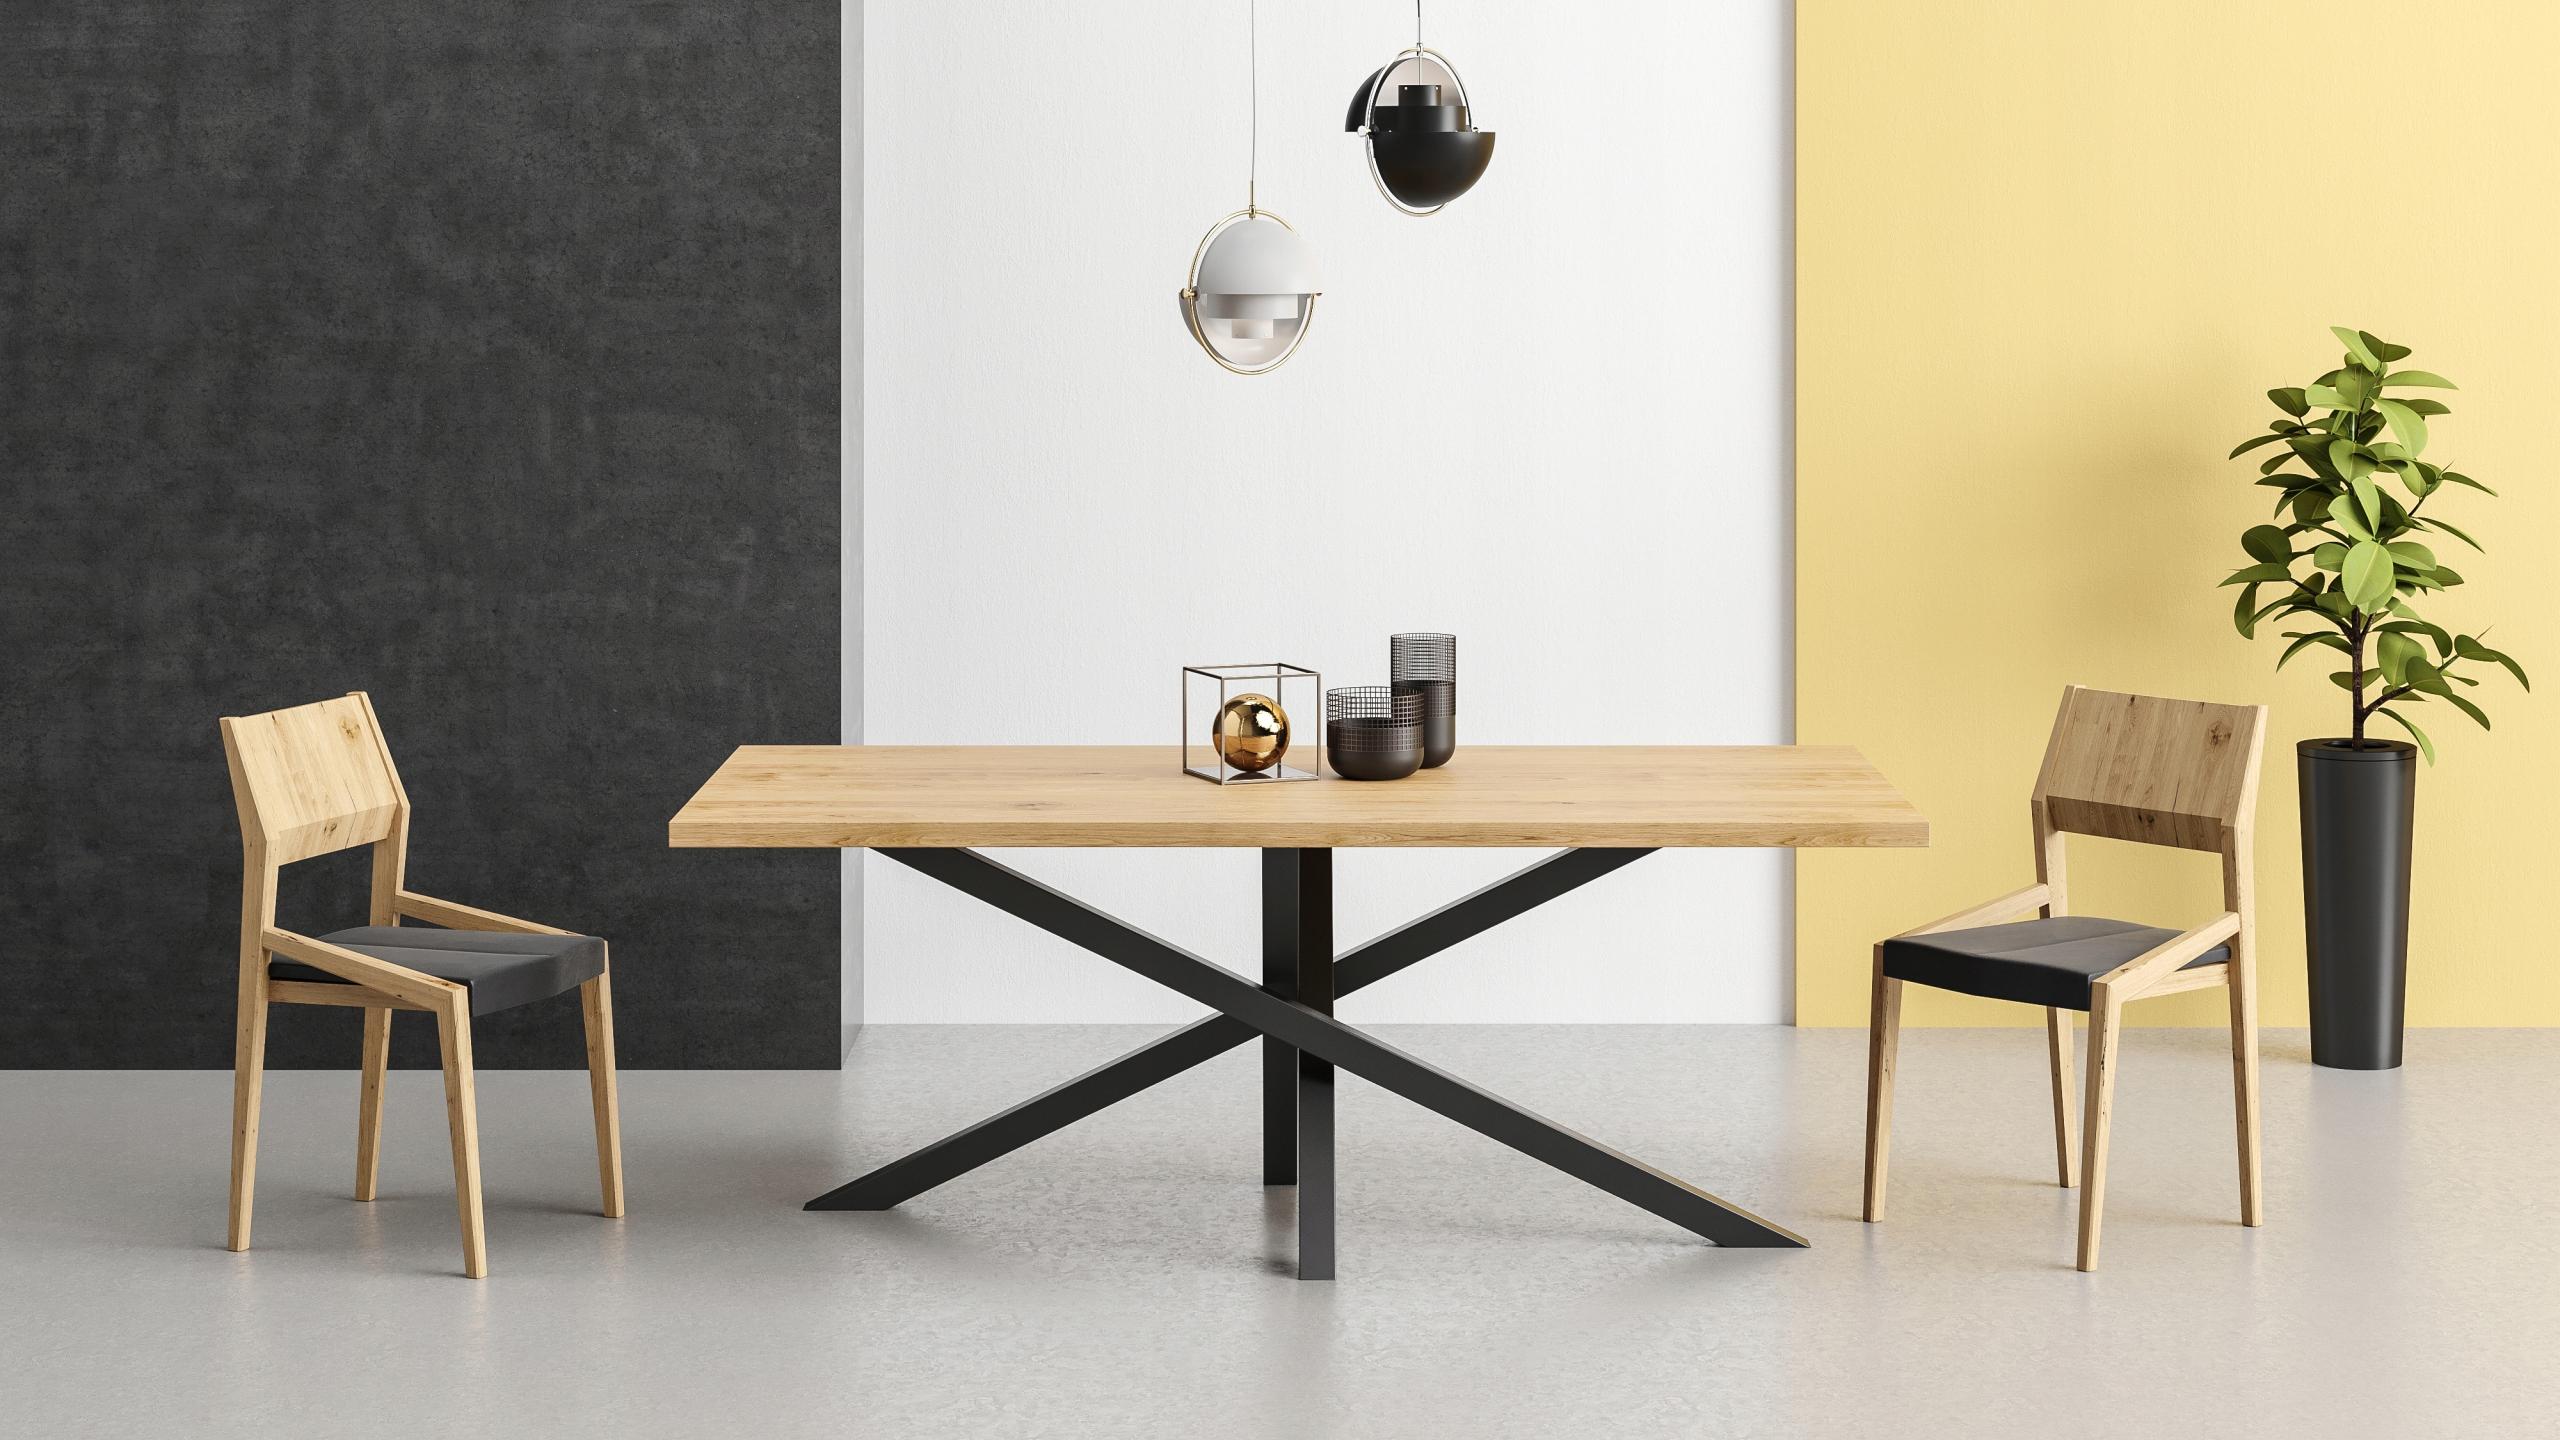 Stôl v štýle LOFT, RETRO, VINTAGE 90 x 200 SLANT